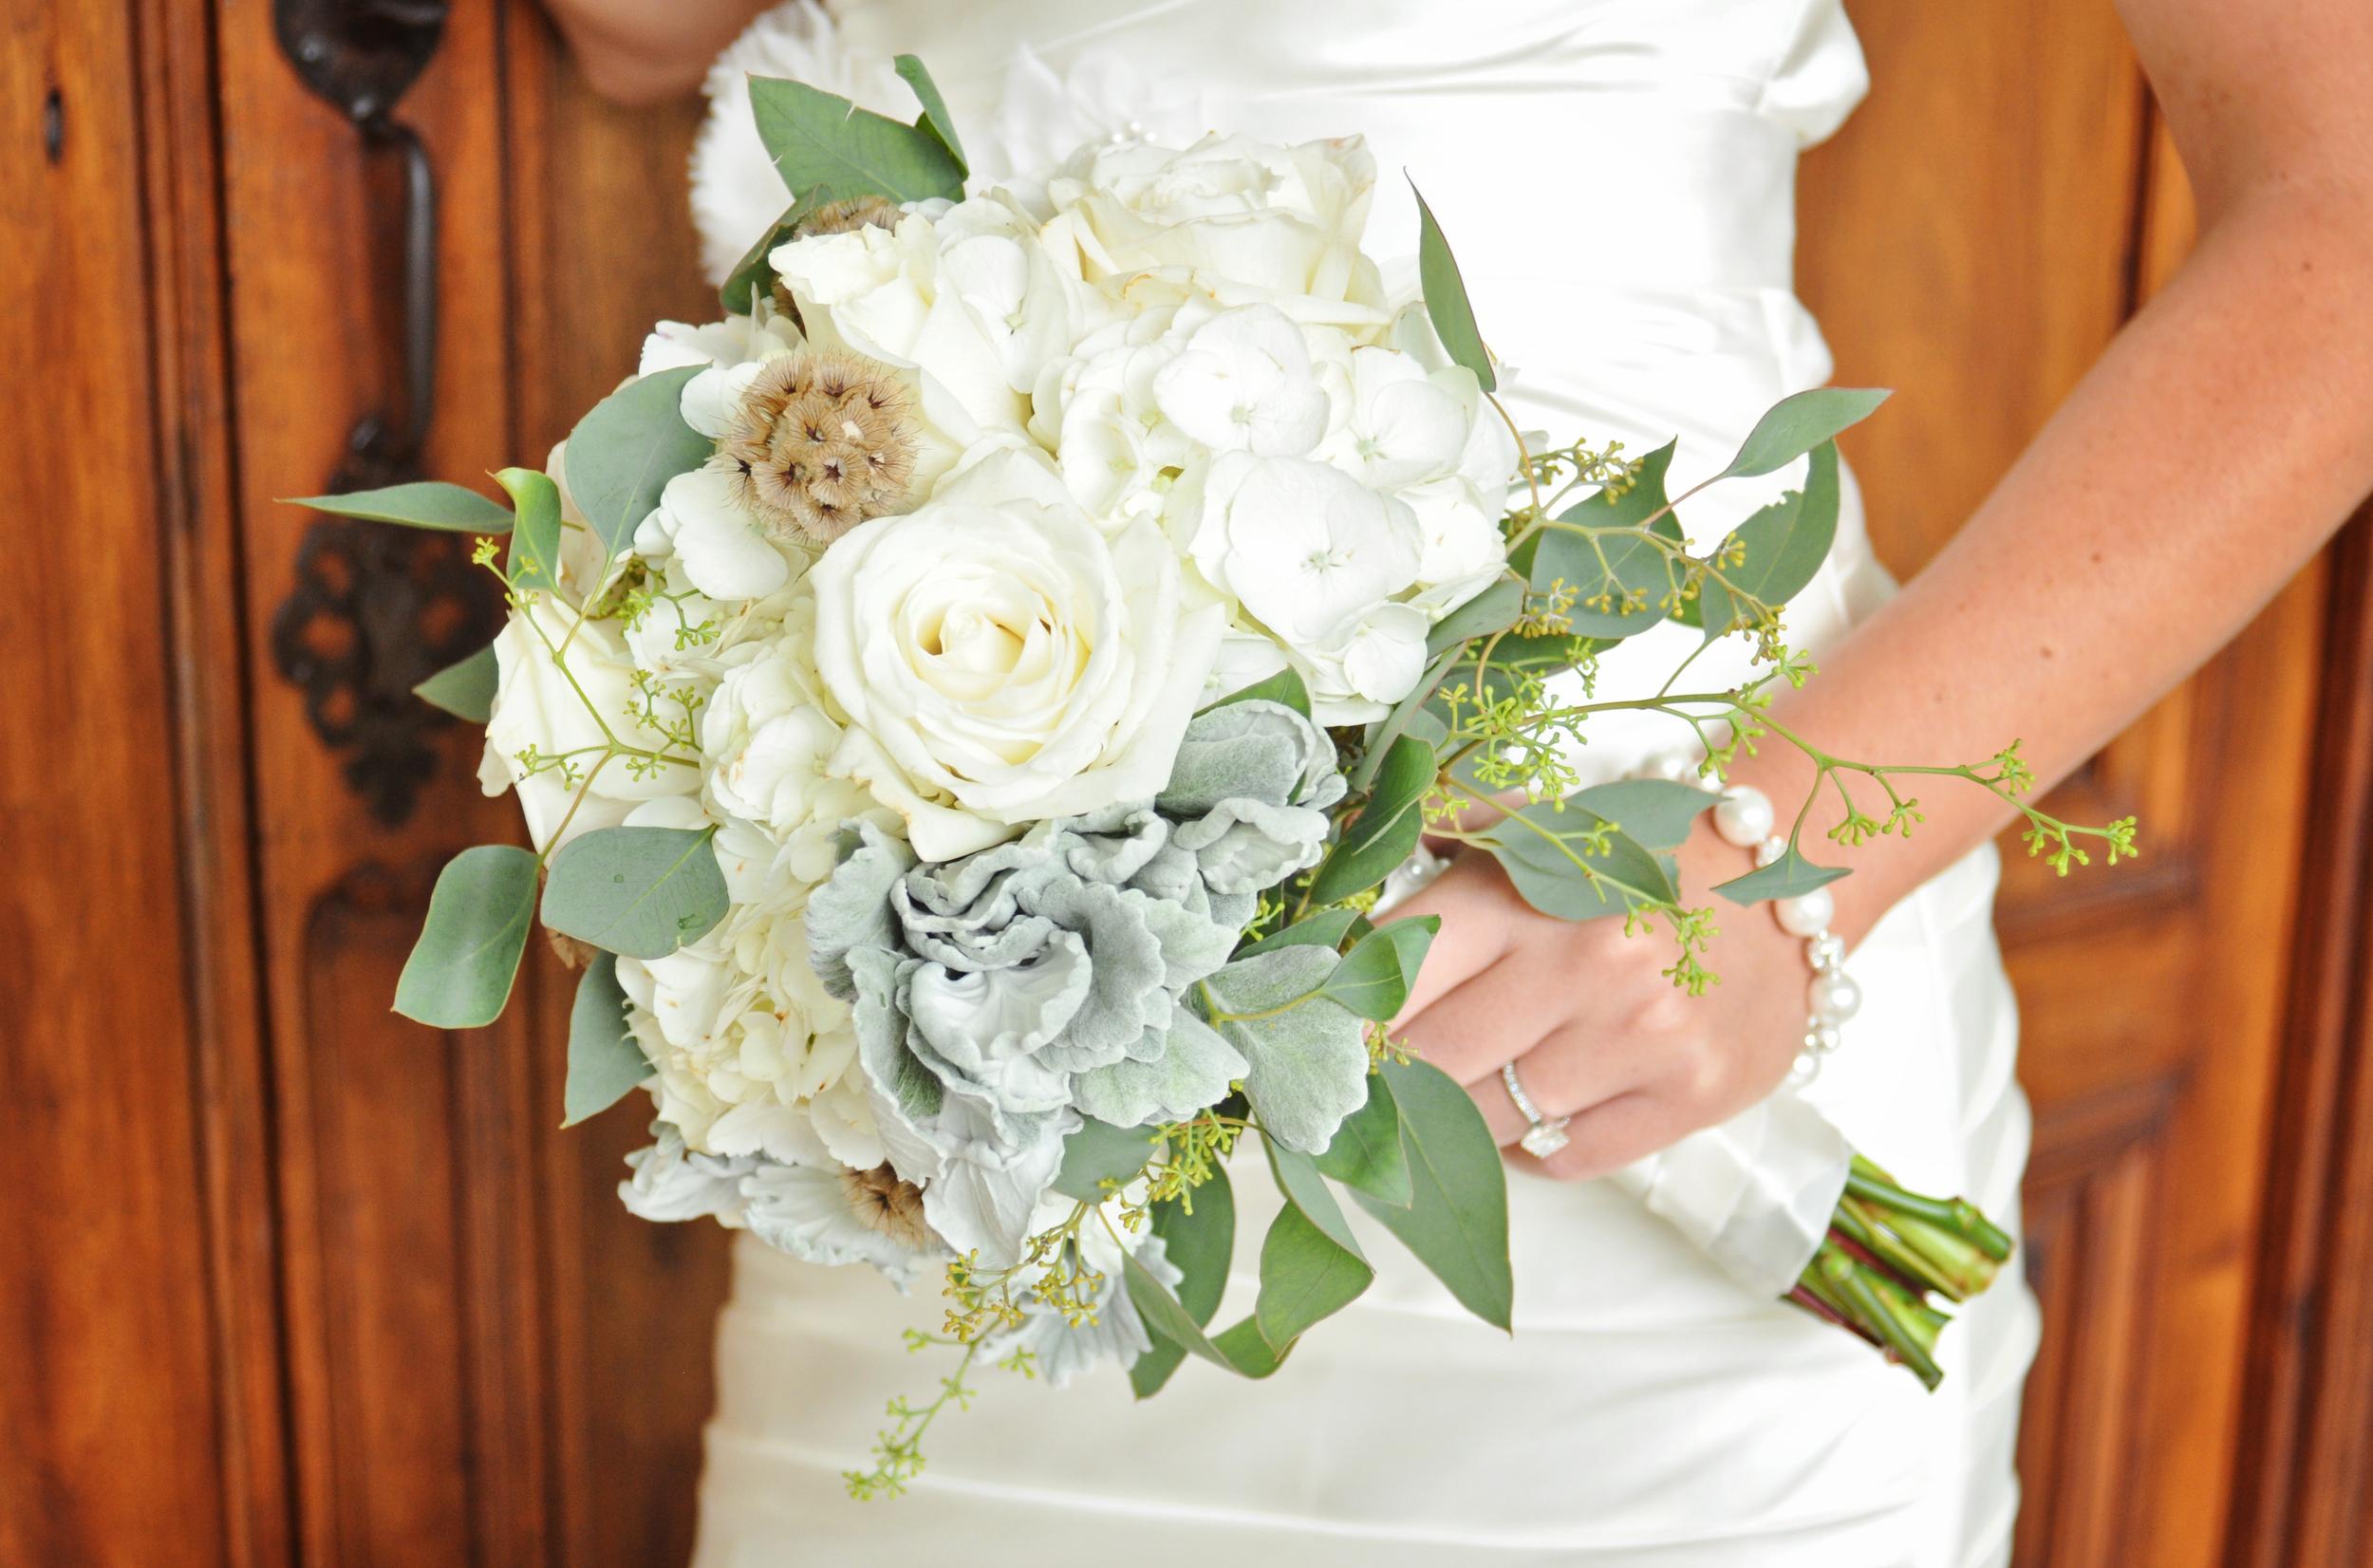 Rustic White, Pratt Place Inn & Barn, Bettencourt Chase Photography, Bouquet